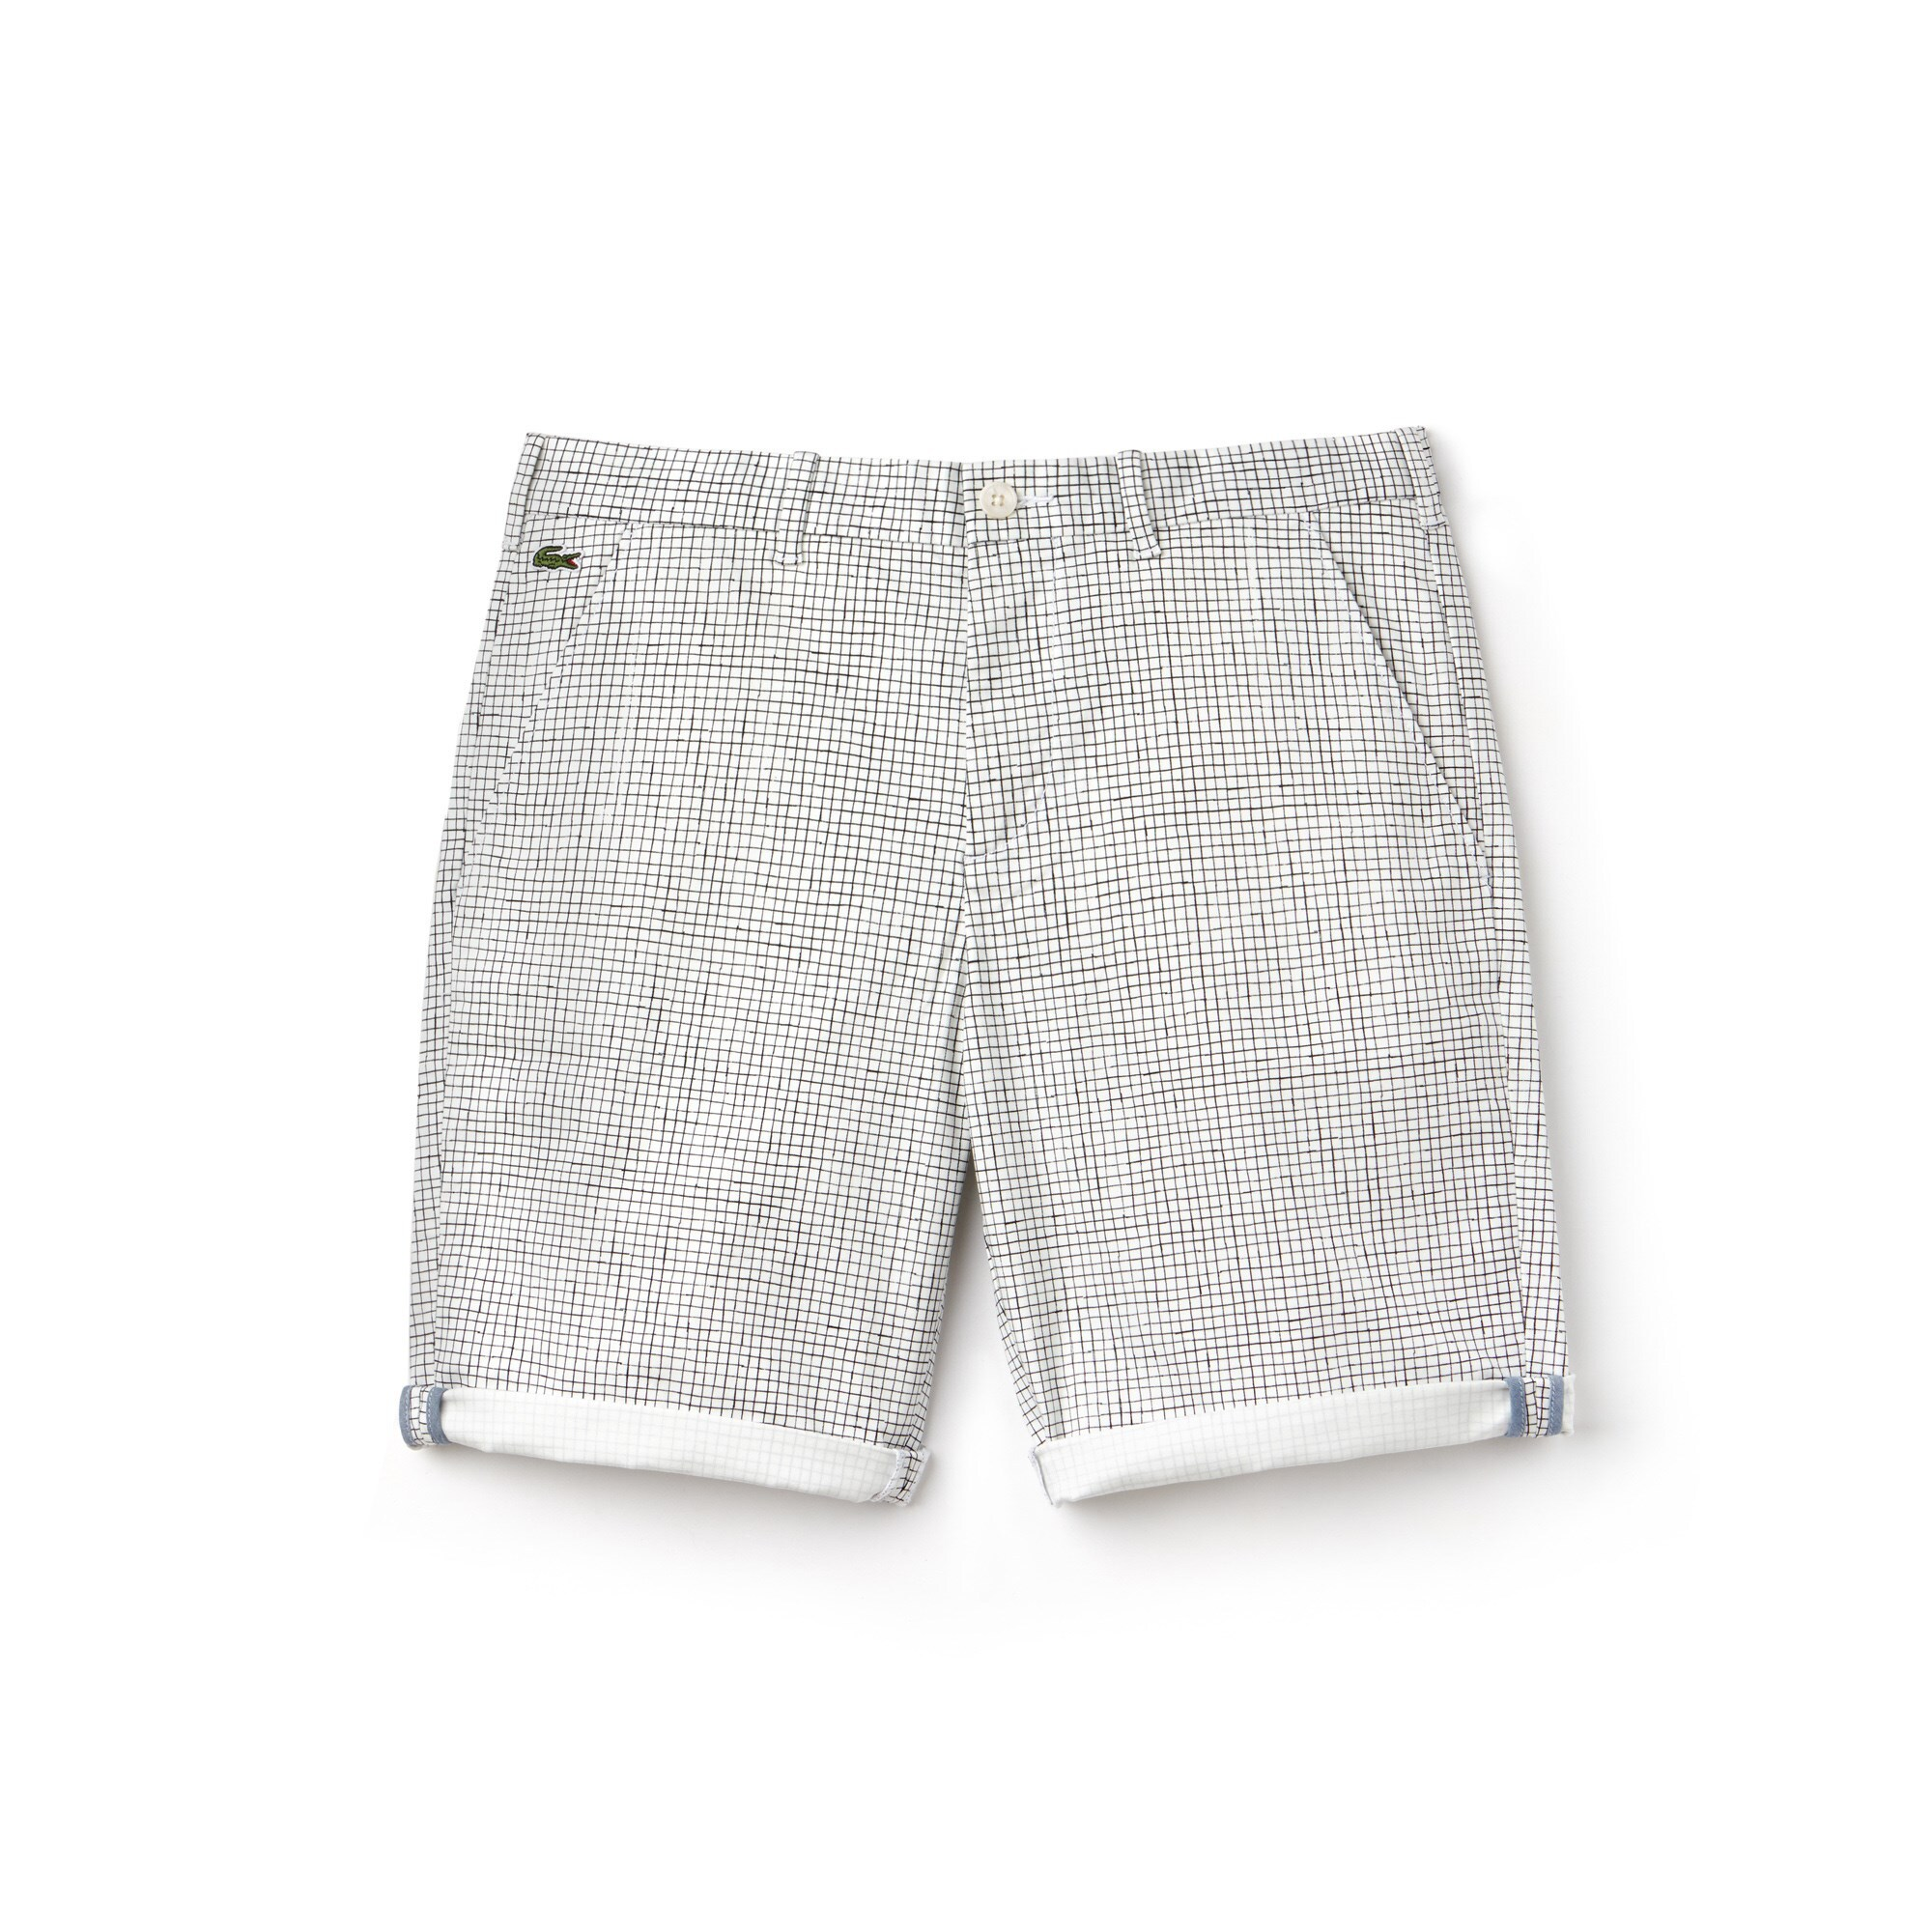 Bermudas Lacoste LIVE de sarga de algodón elástica con minicuadros